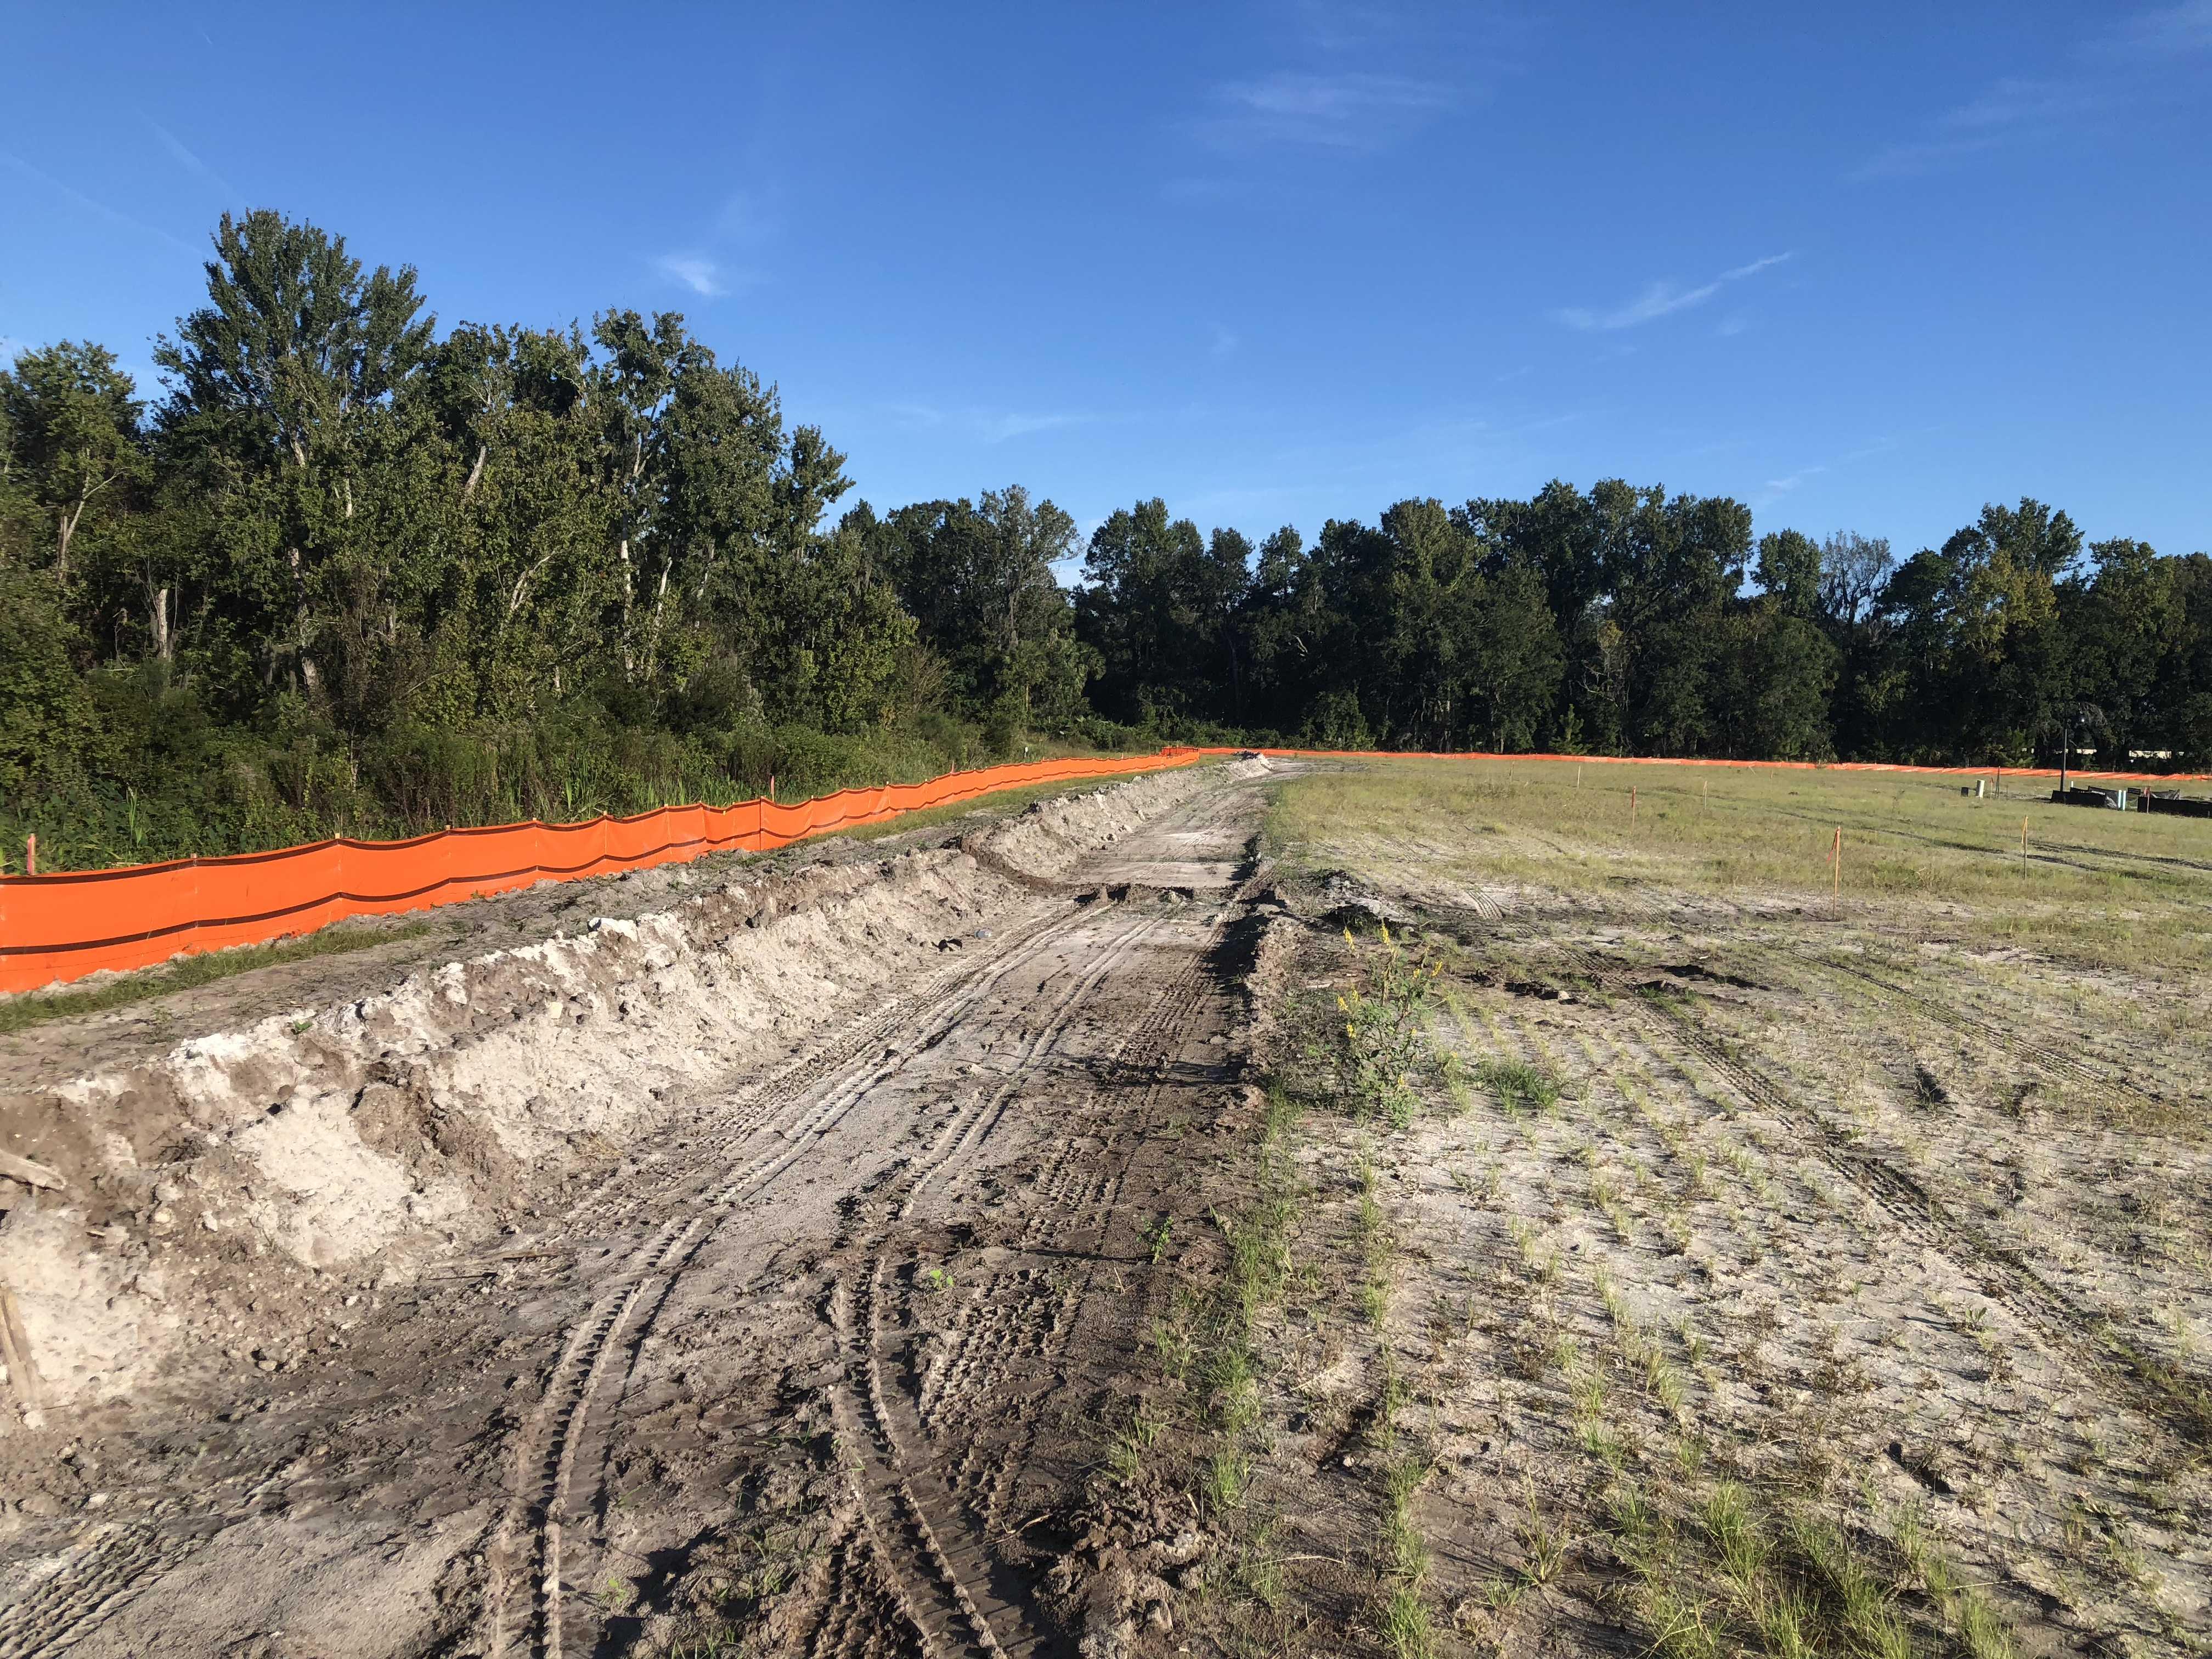 The Last Line Of De Fence Kci Environmental Compliance